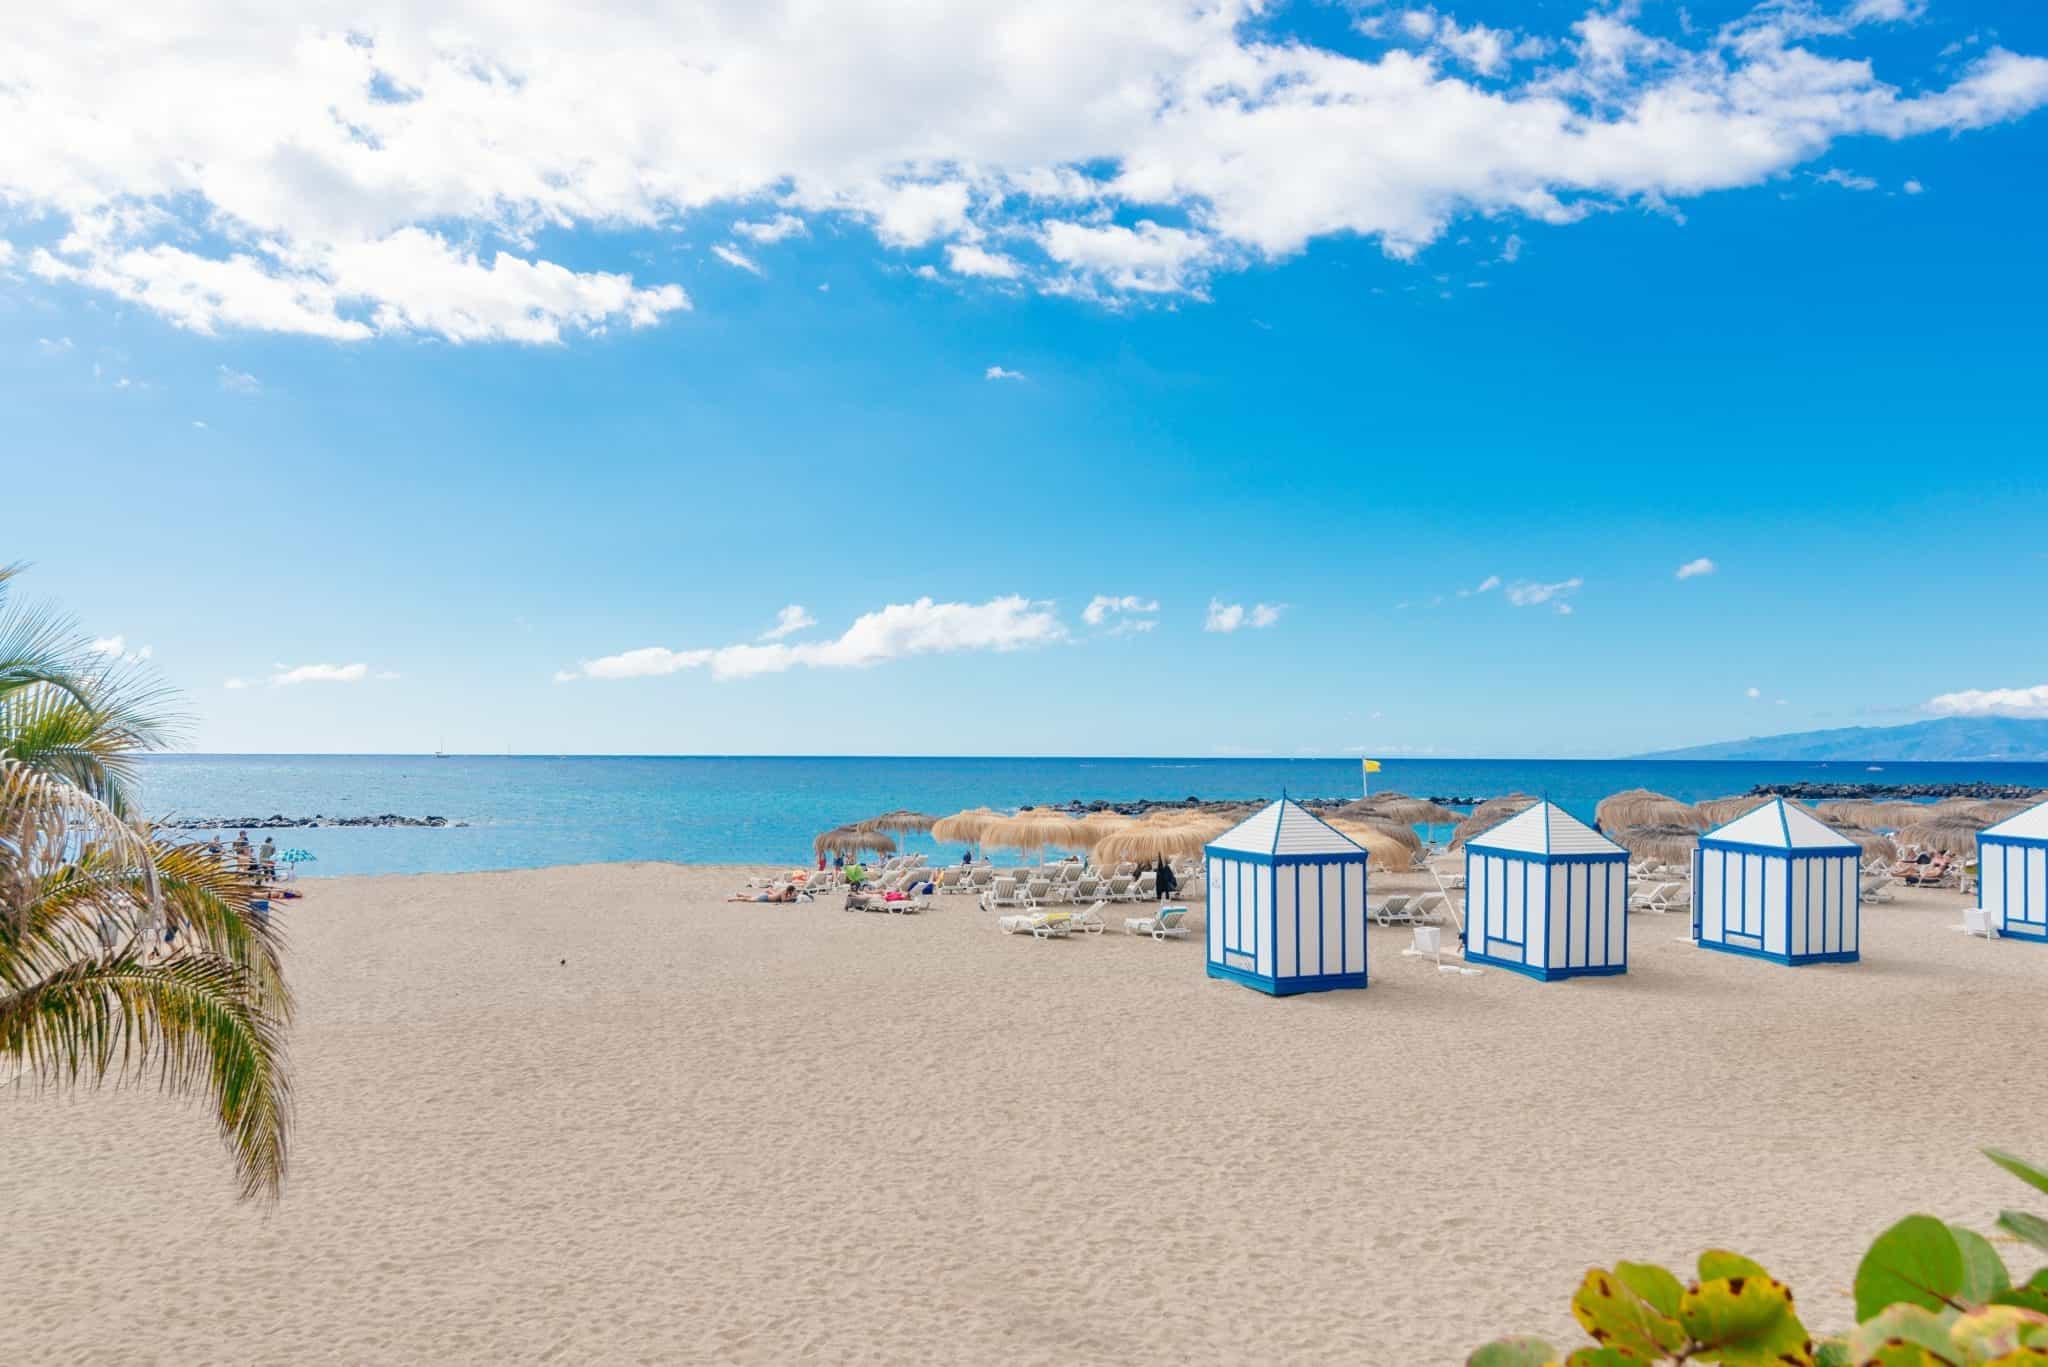 Playa El Duque beach with tropical palm trees in Costa Adeje